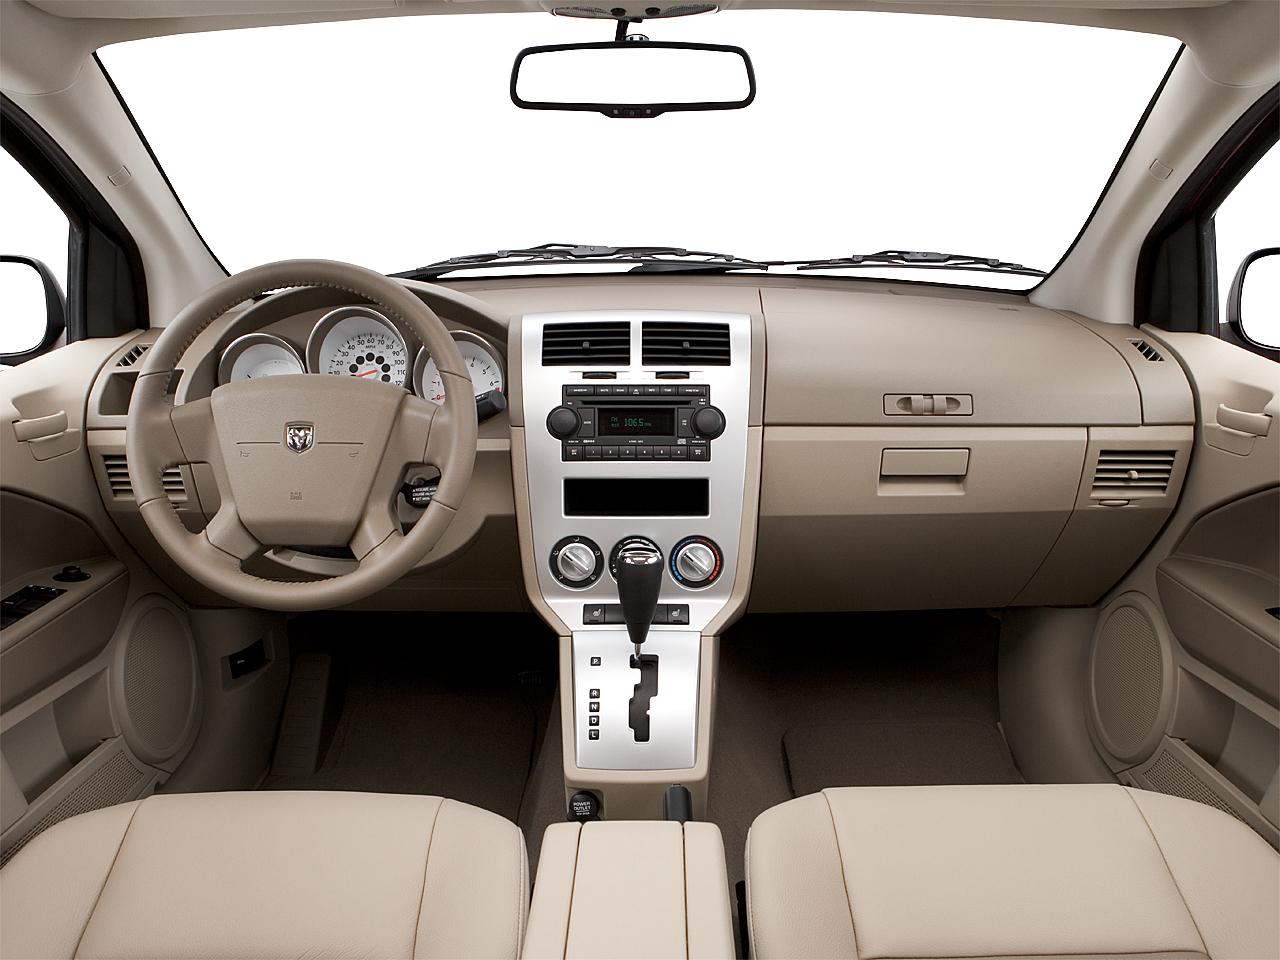 2007 Dodge Caliber SXT, centered wide dash shot